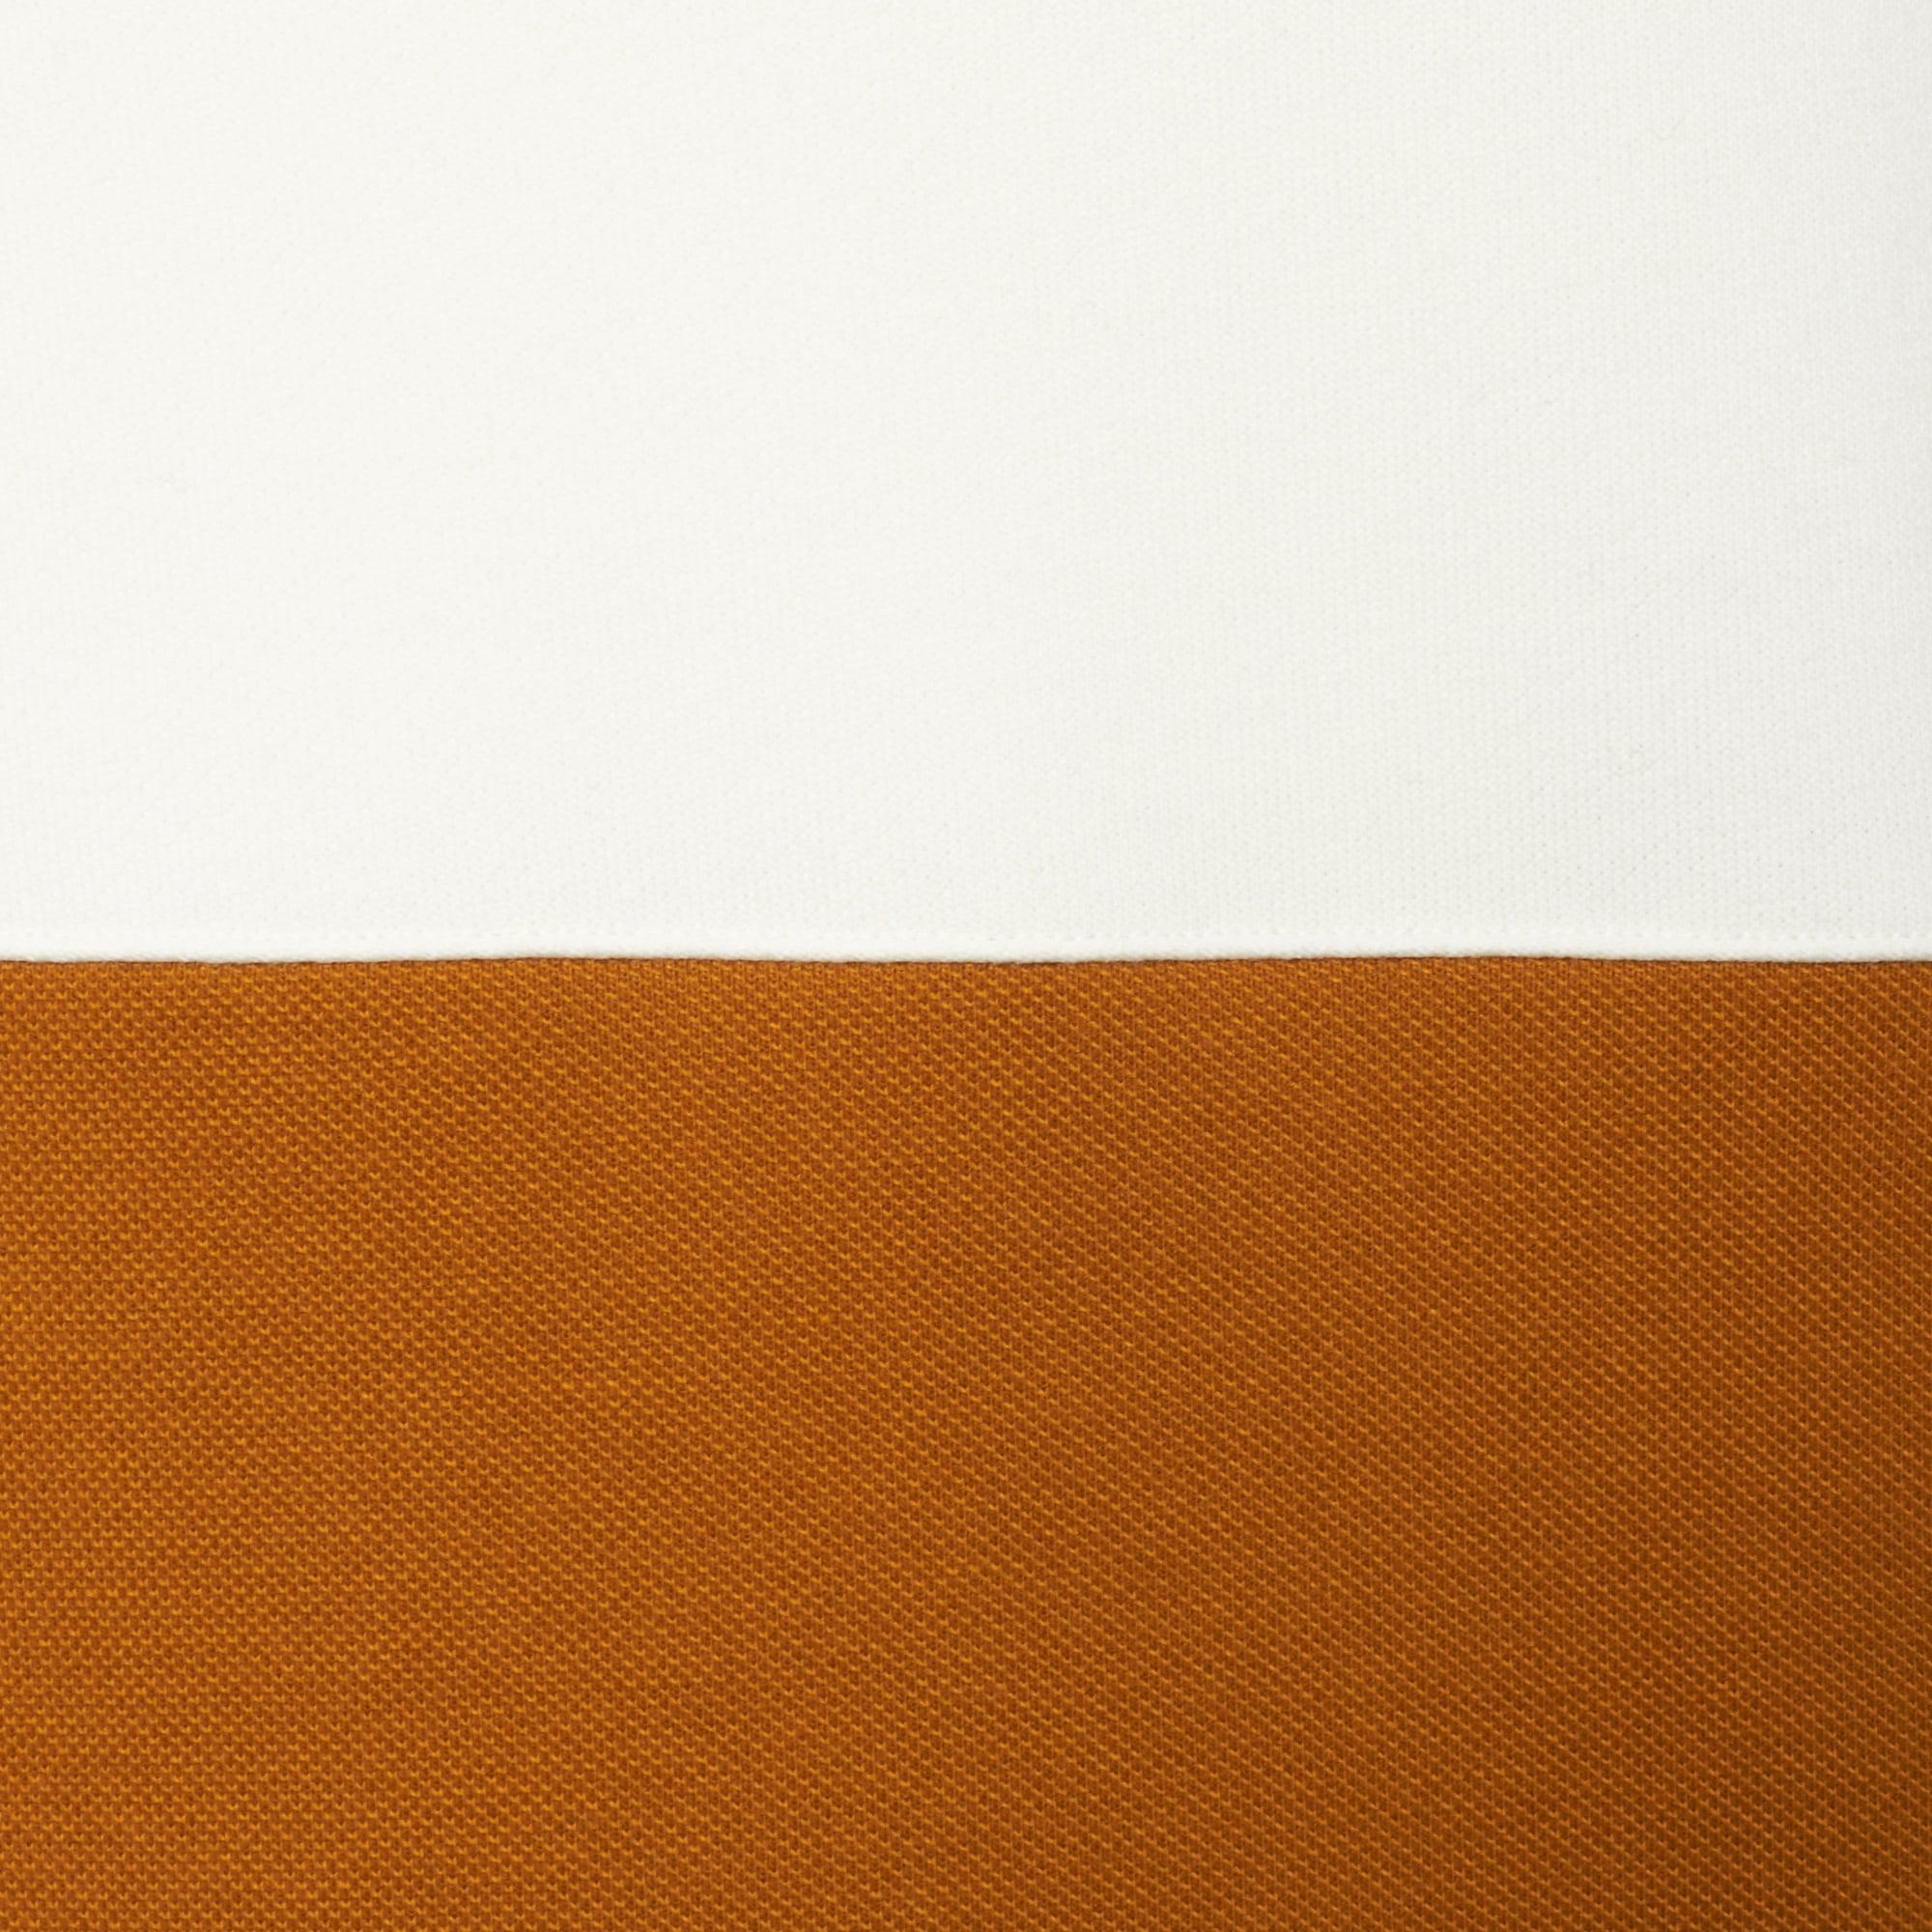 7fb564dc8609 Lyst - Lacoste Cream   Gold Colourblock Sweatshirt for Men